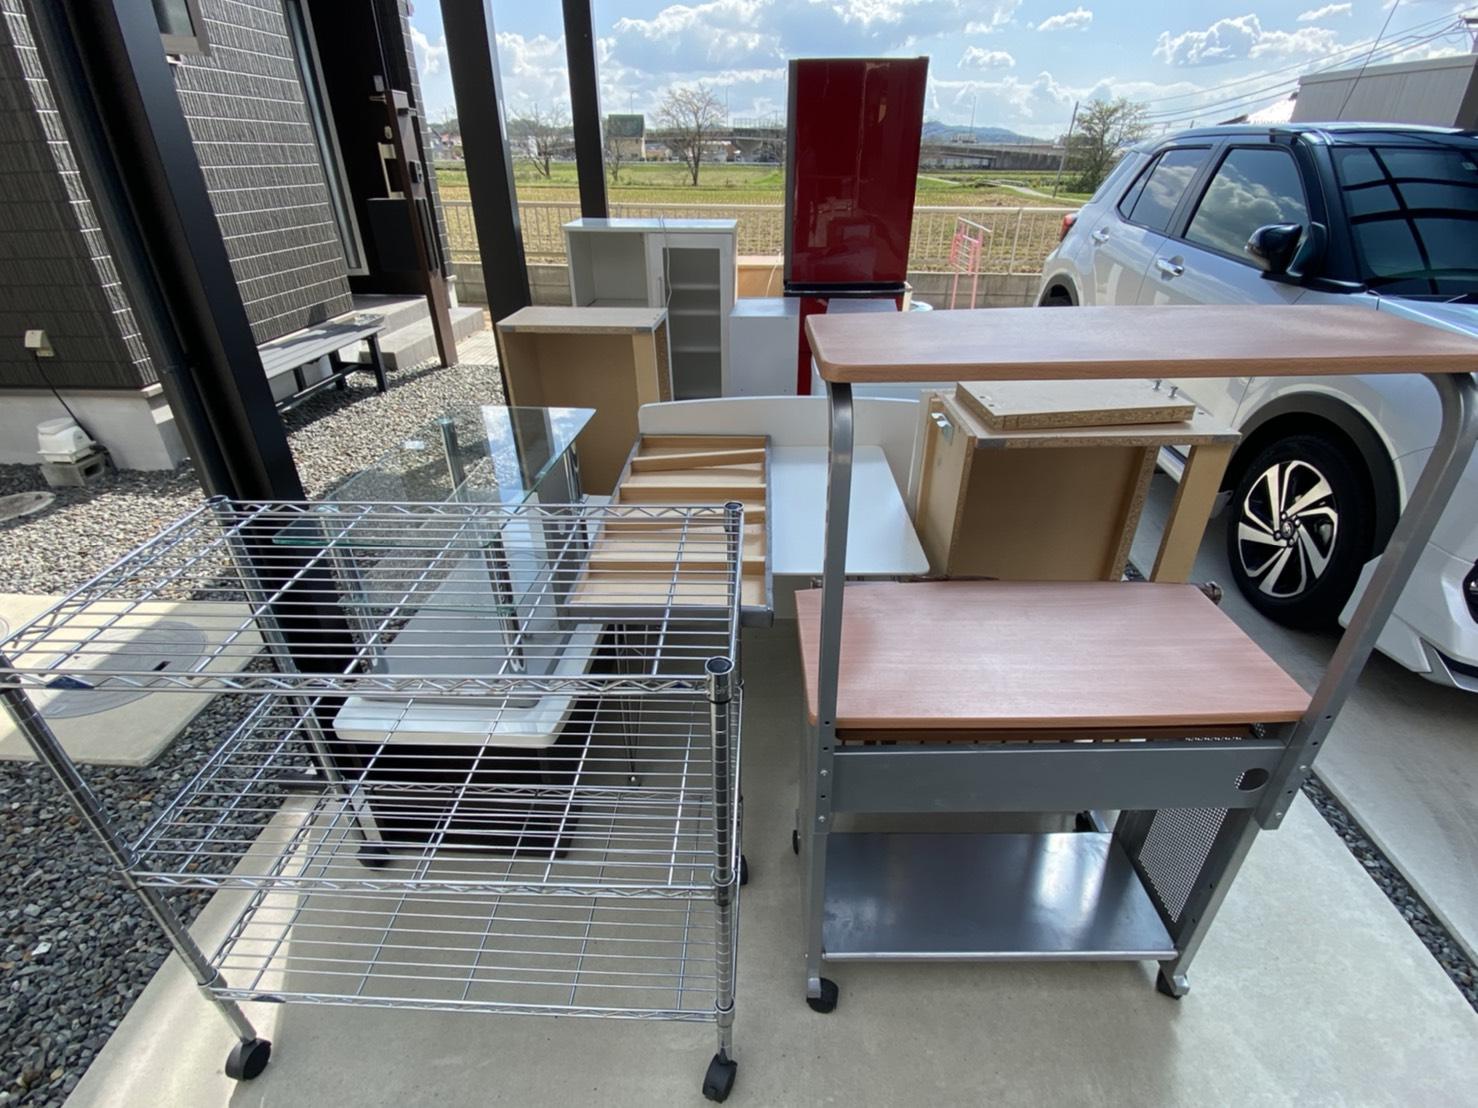 PCデスク、机、食器棚、冷蔵庫の回収前